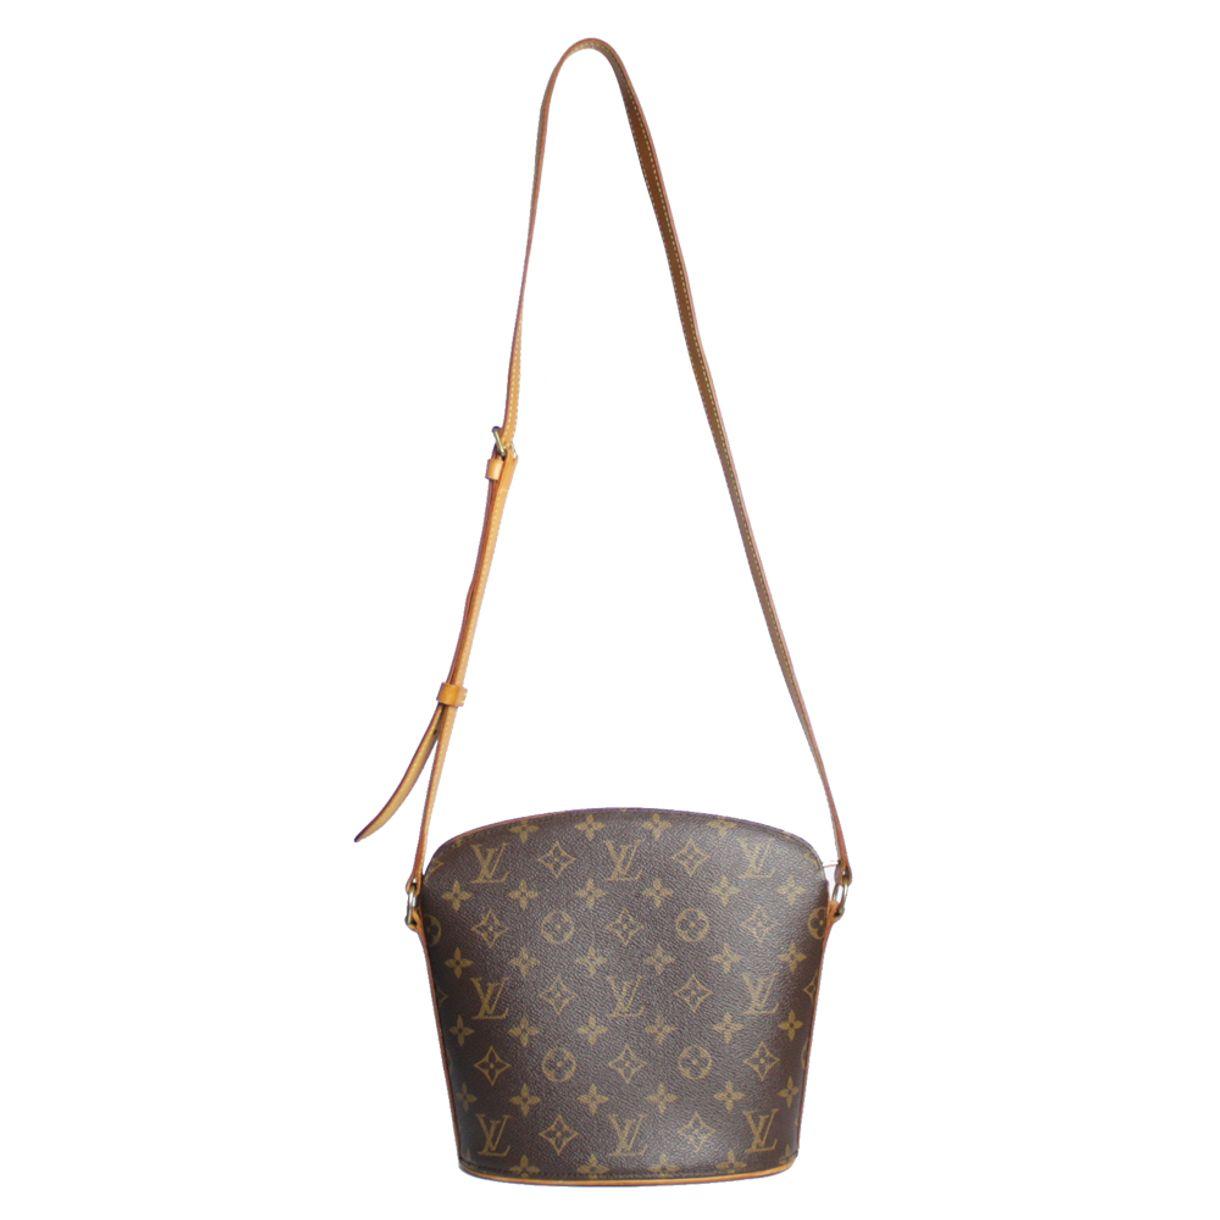 Bolsa-Louis-Vuitton-Monogram-Drouot-Crossbody